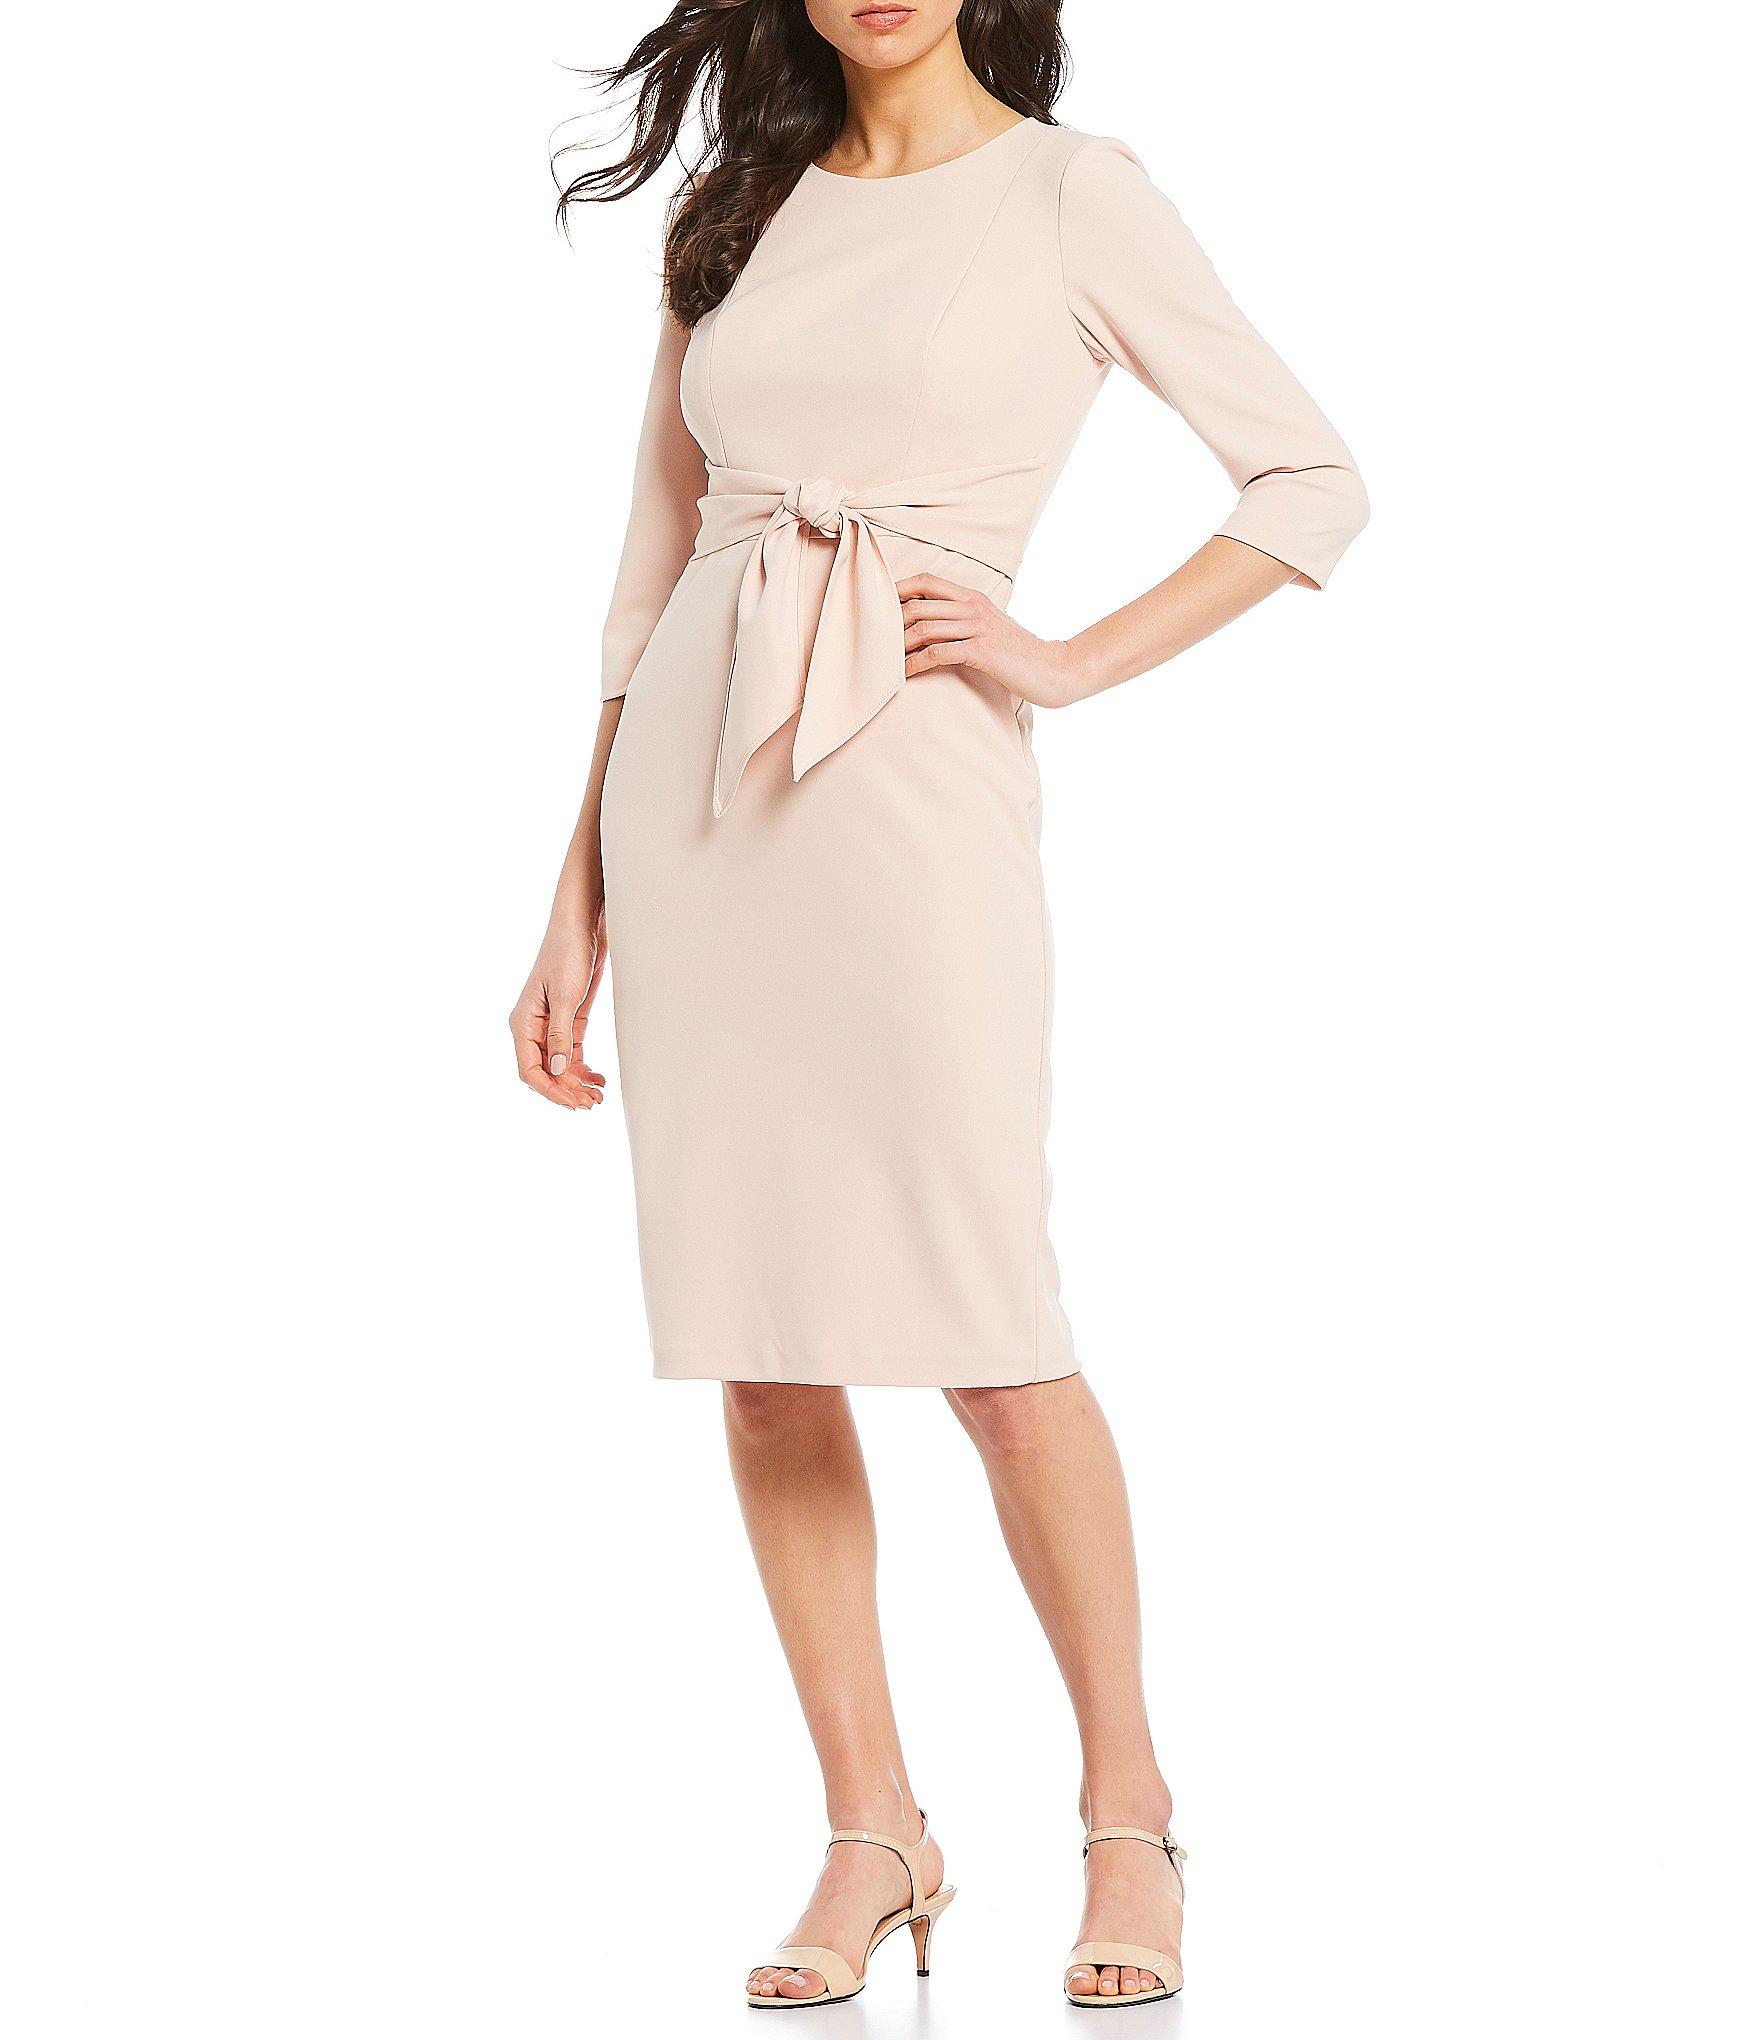 blush dress | Dillard's